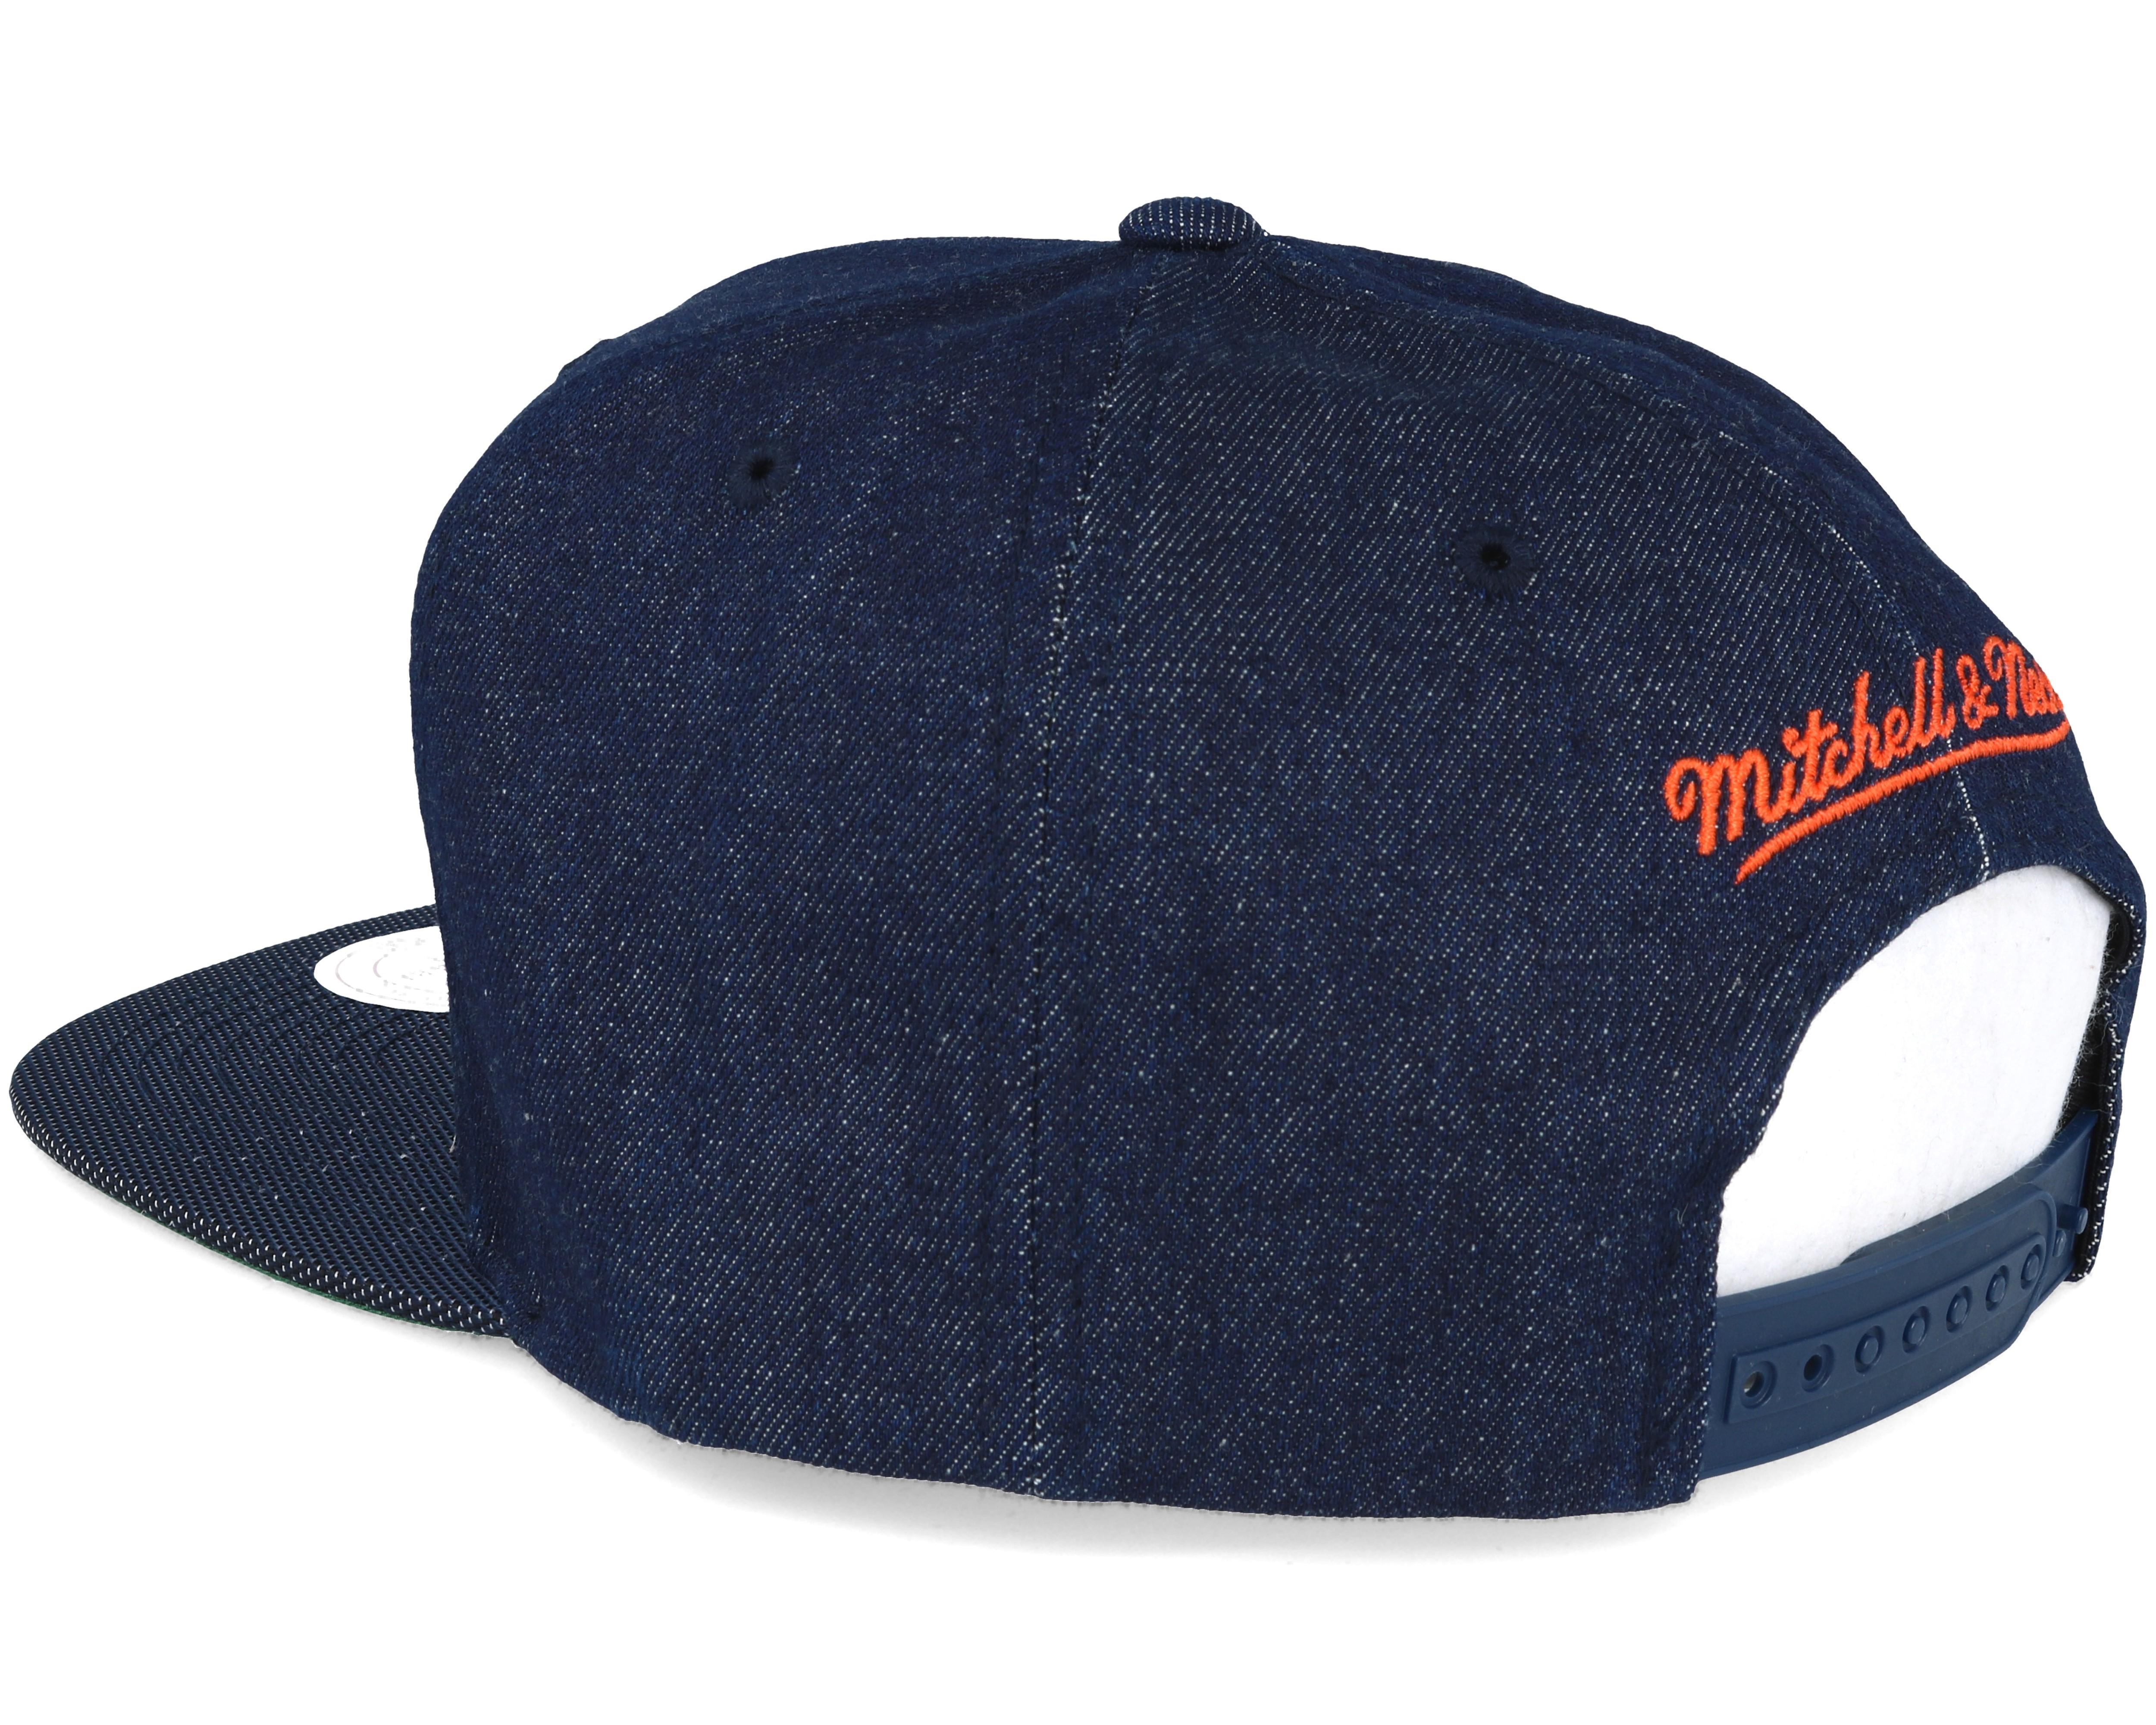 56e041bc15c02 New York Knicks Raw Denim 3T PU Snapback - Mitchell   Ness caps ...